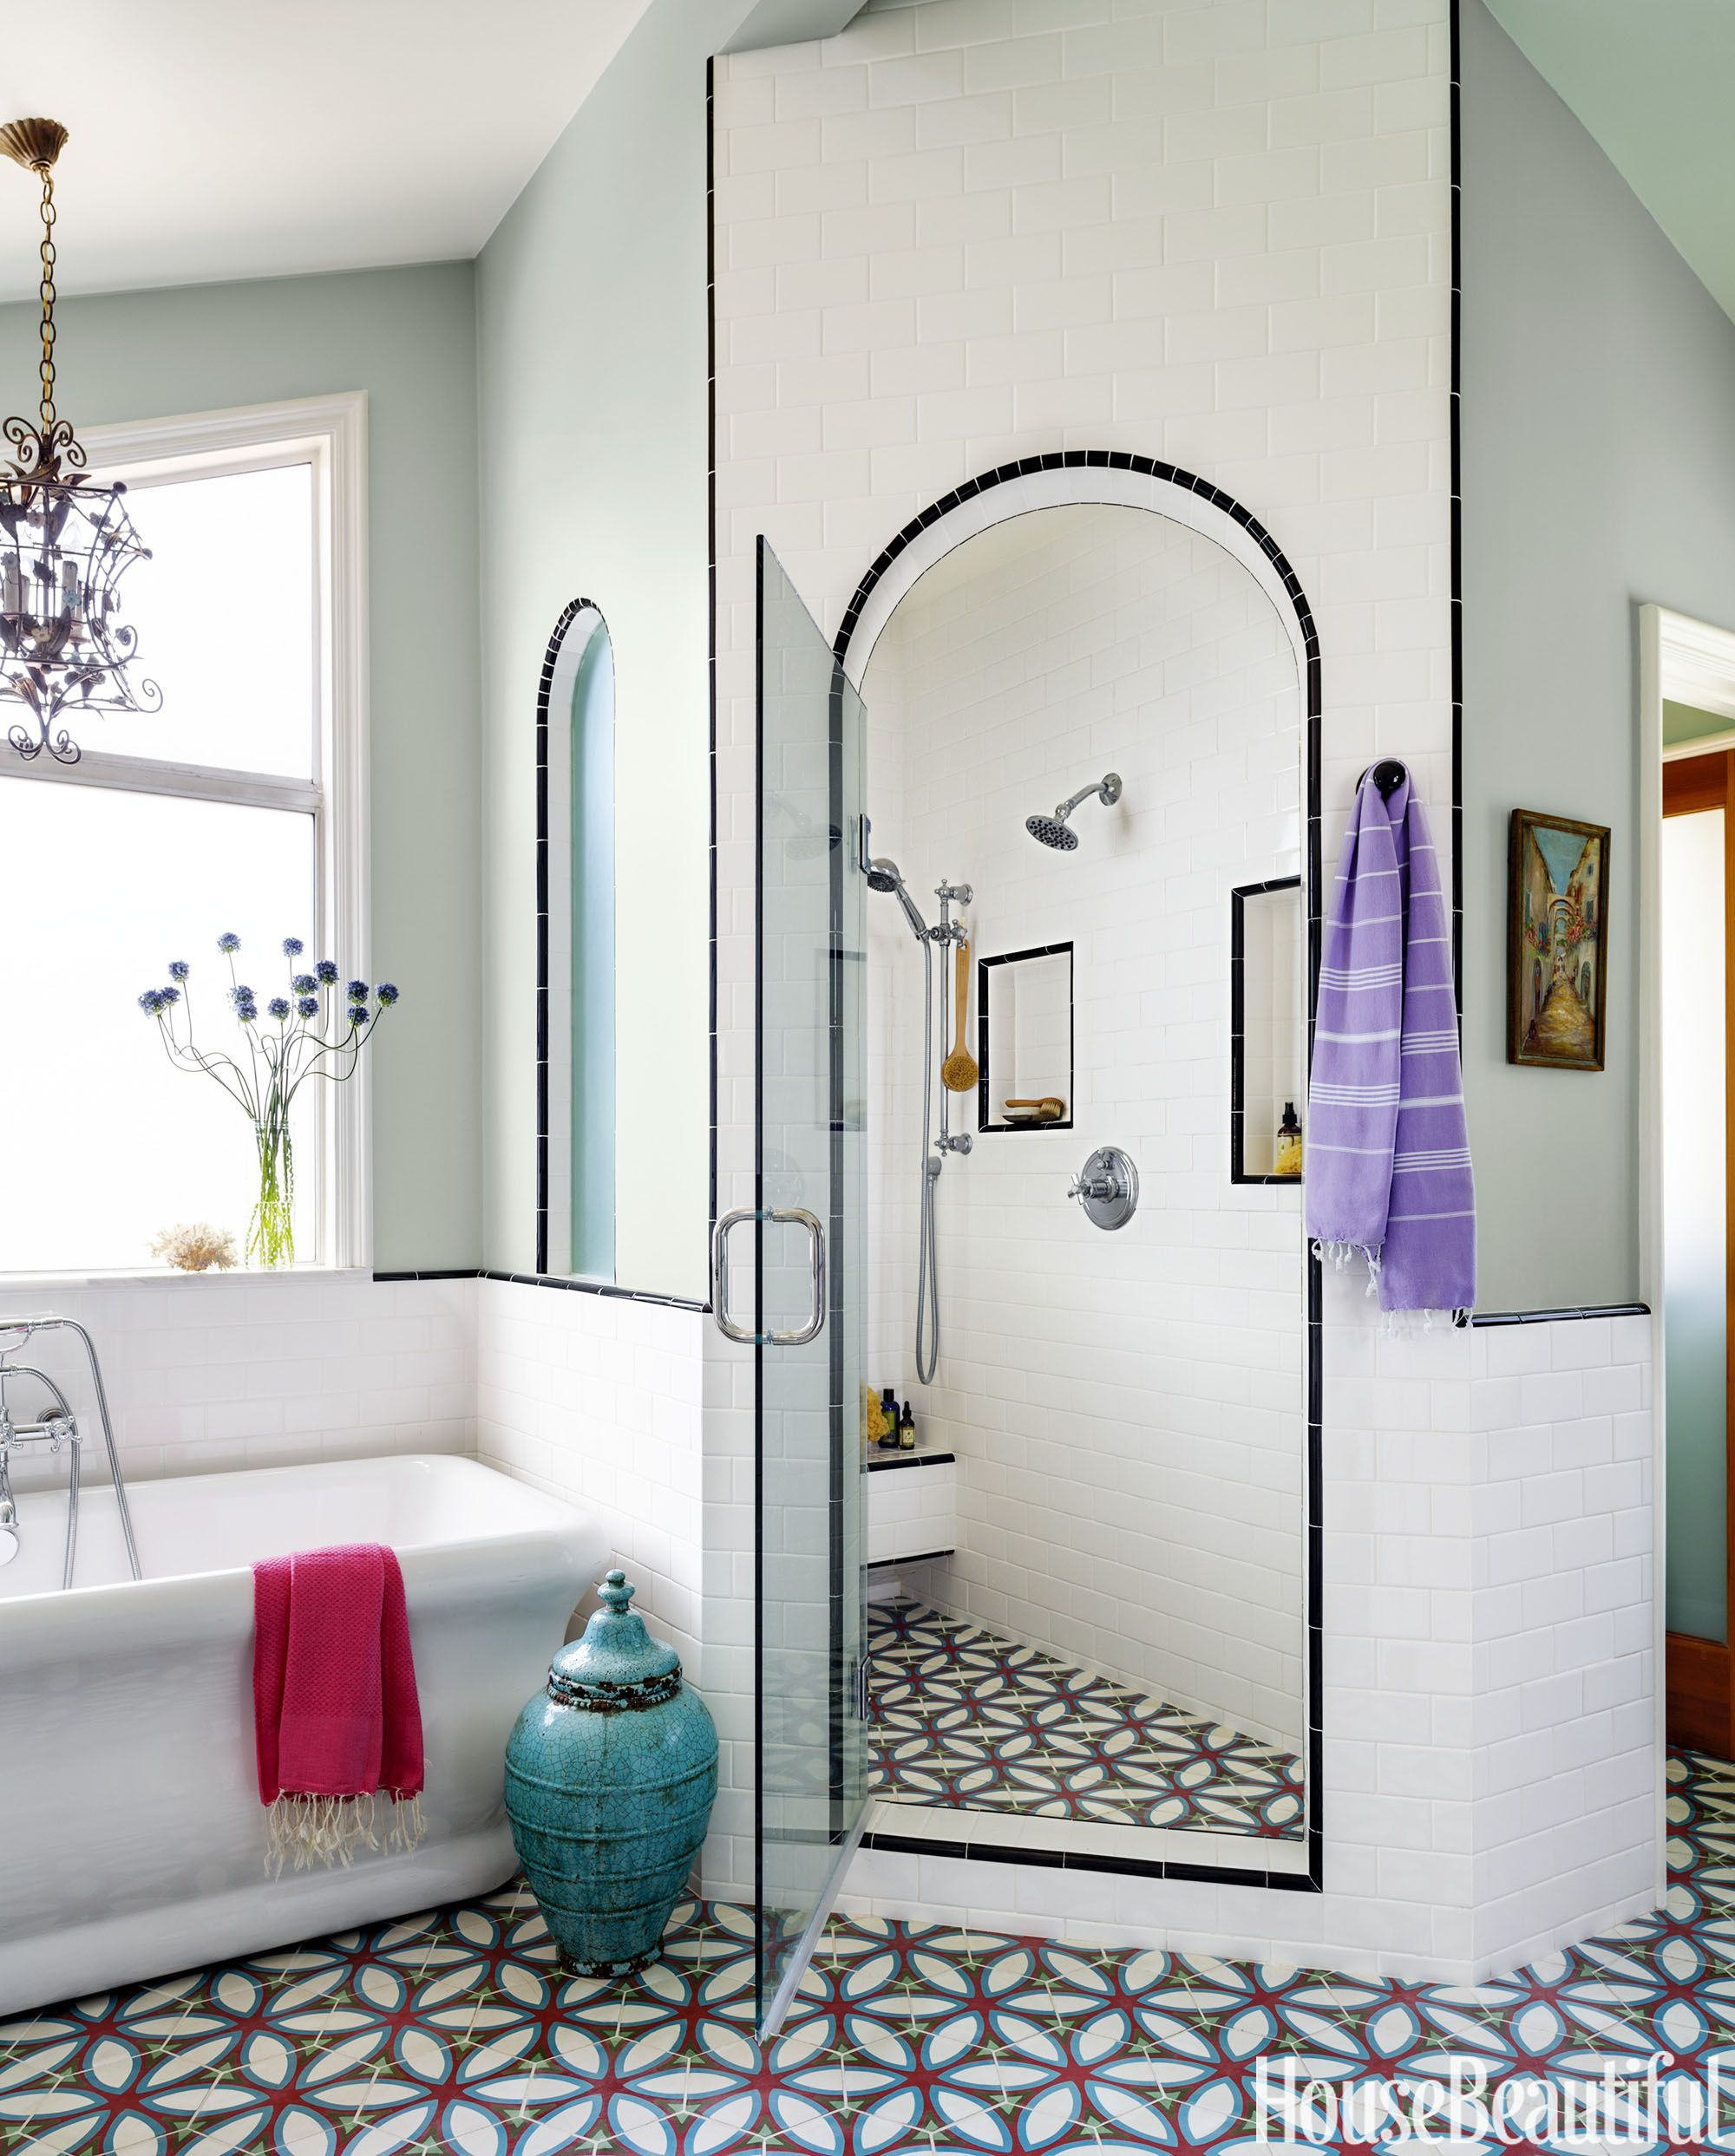 Decorating A Peach Bathroom: Ideas & Inspiration